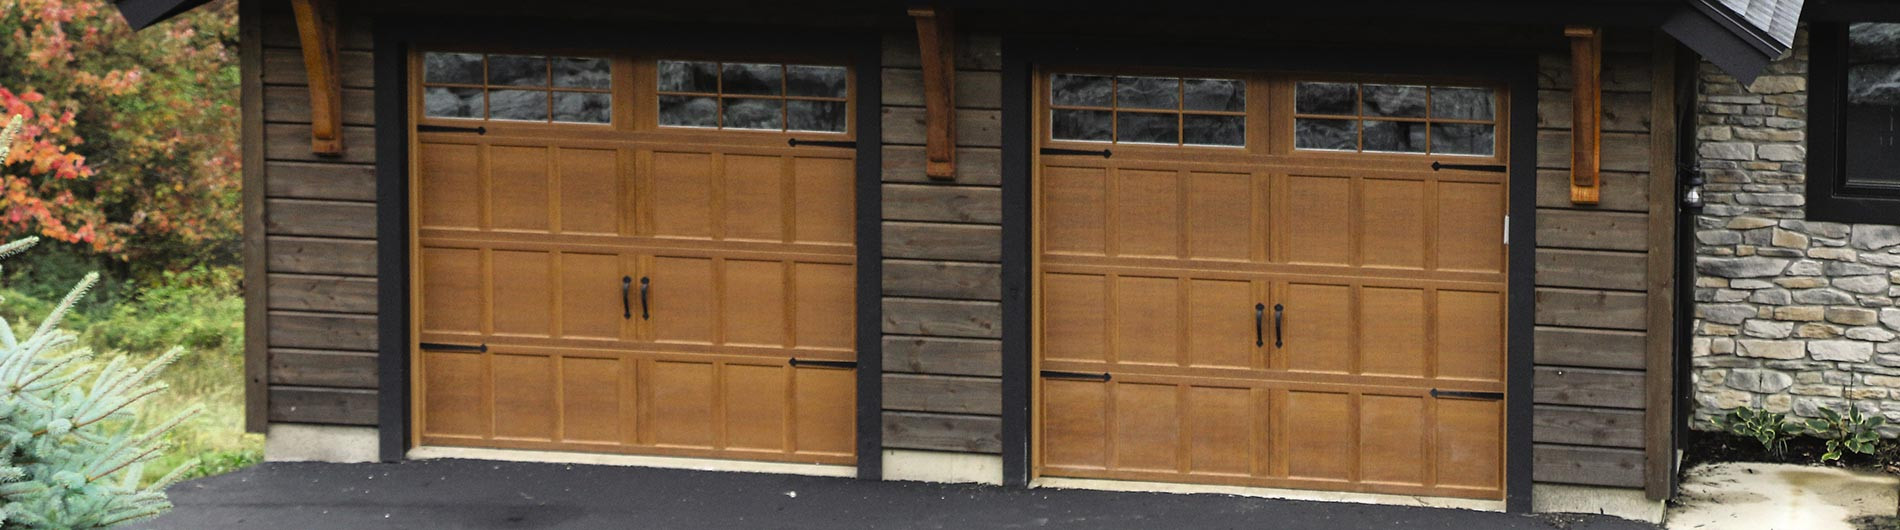 9700-CH-Garage-Door-Providence-NaturalOa